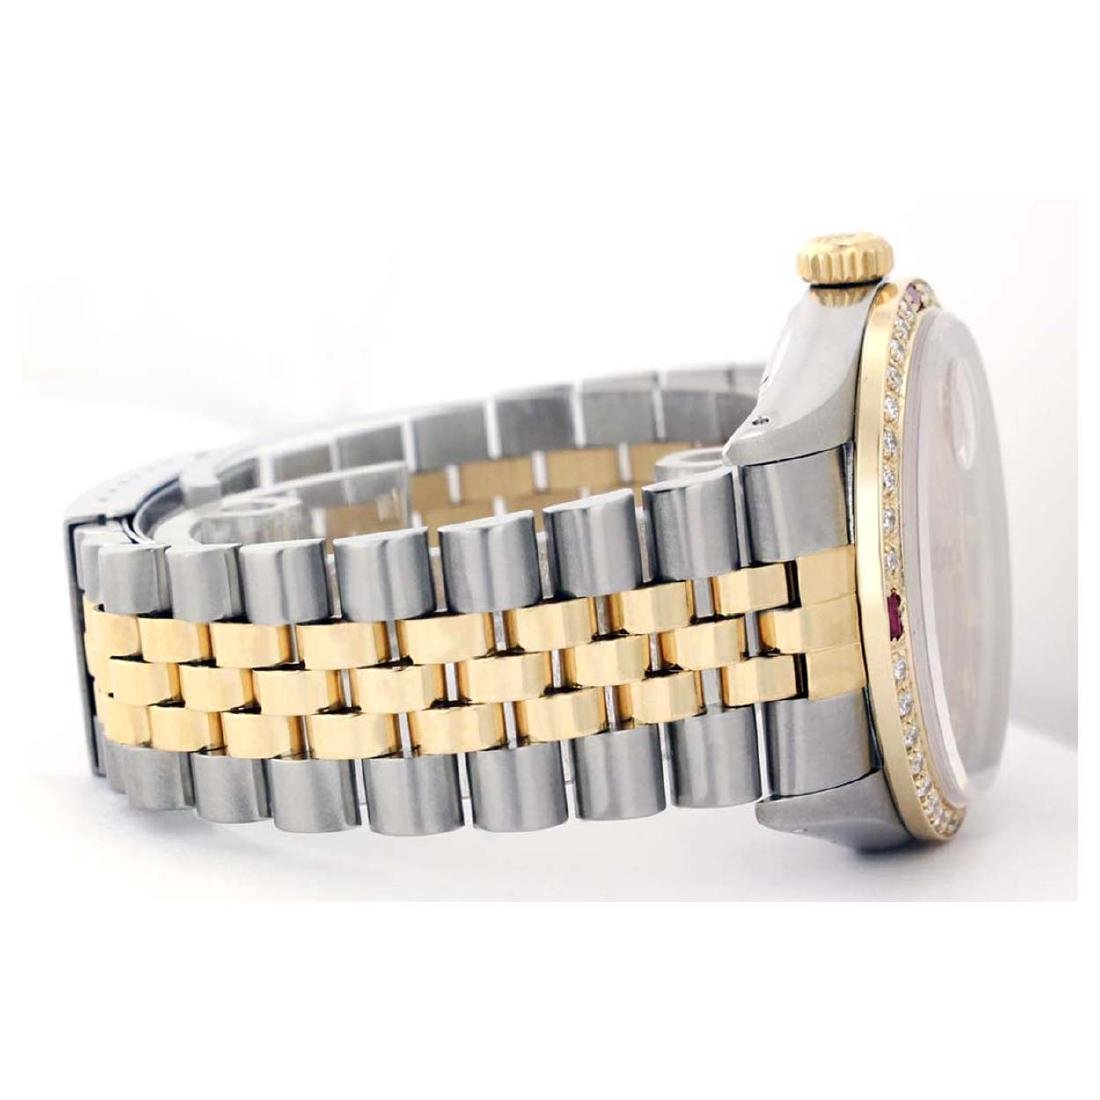 Rolex Men's Two Tone 14K Gold/SS, QuickSet, Diam Pave - 4